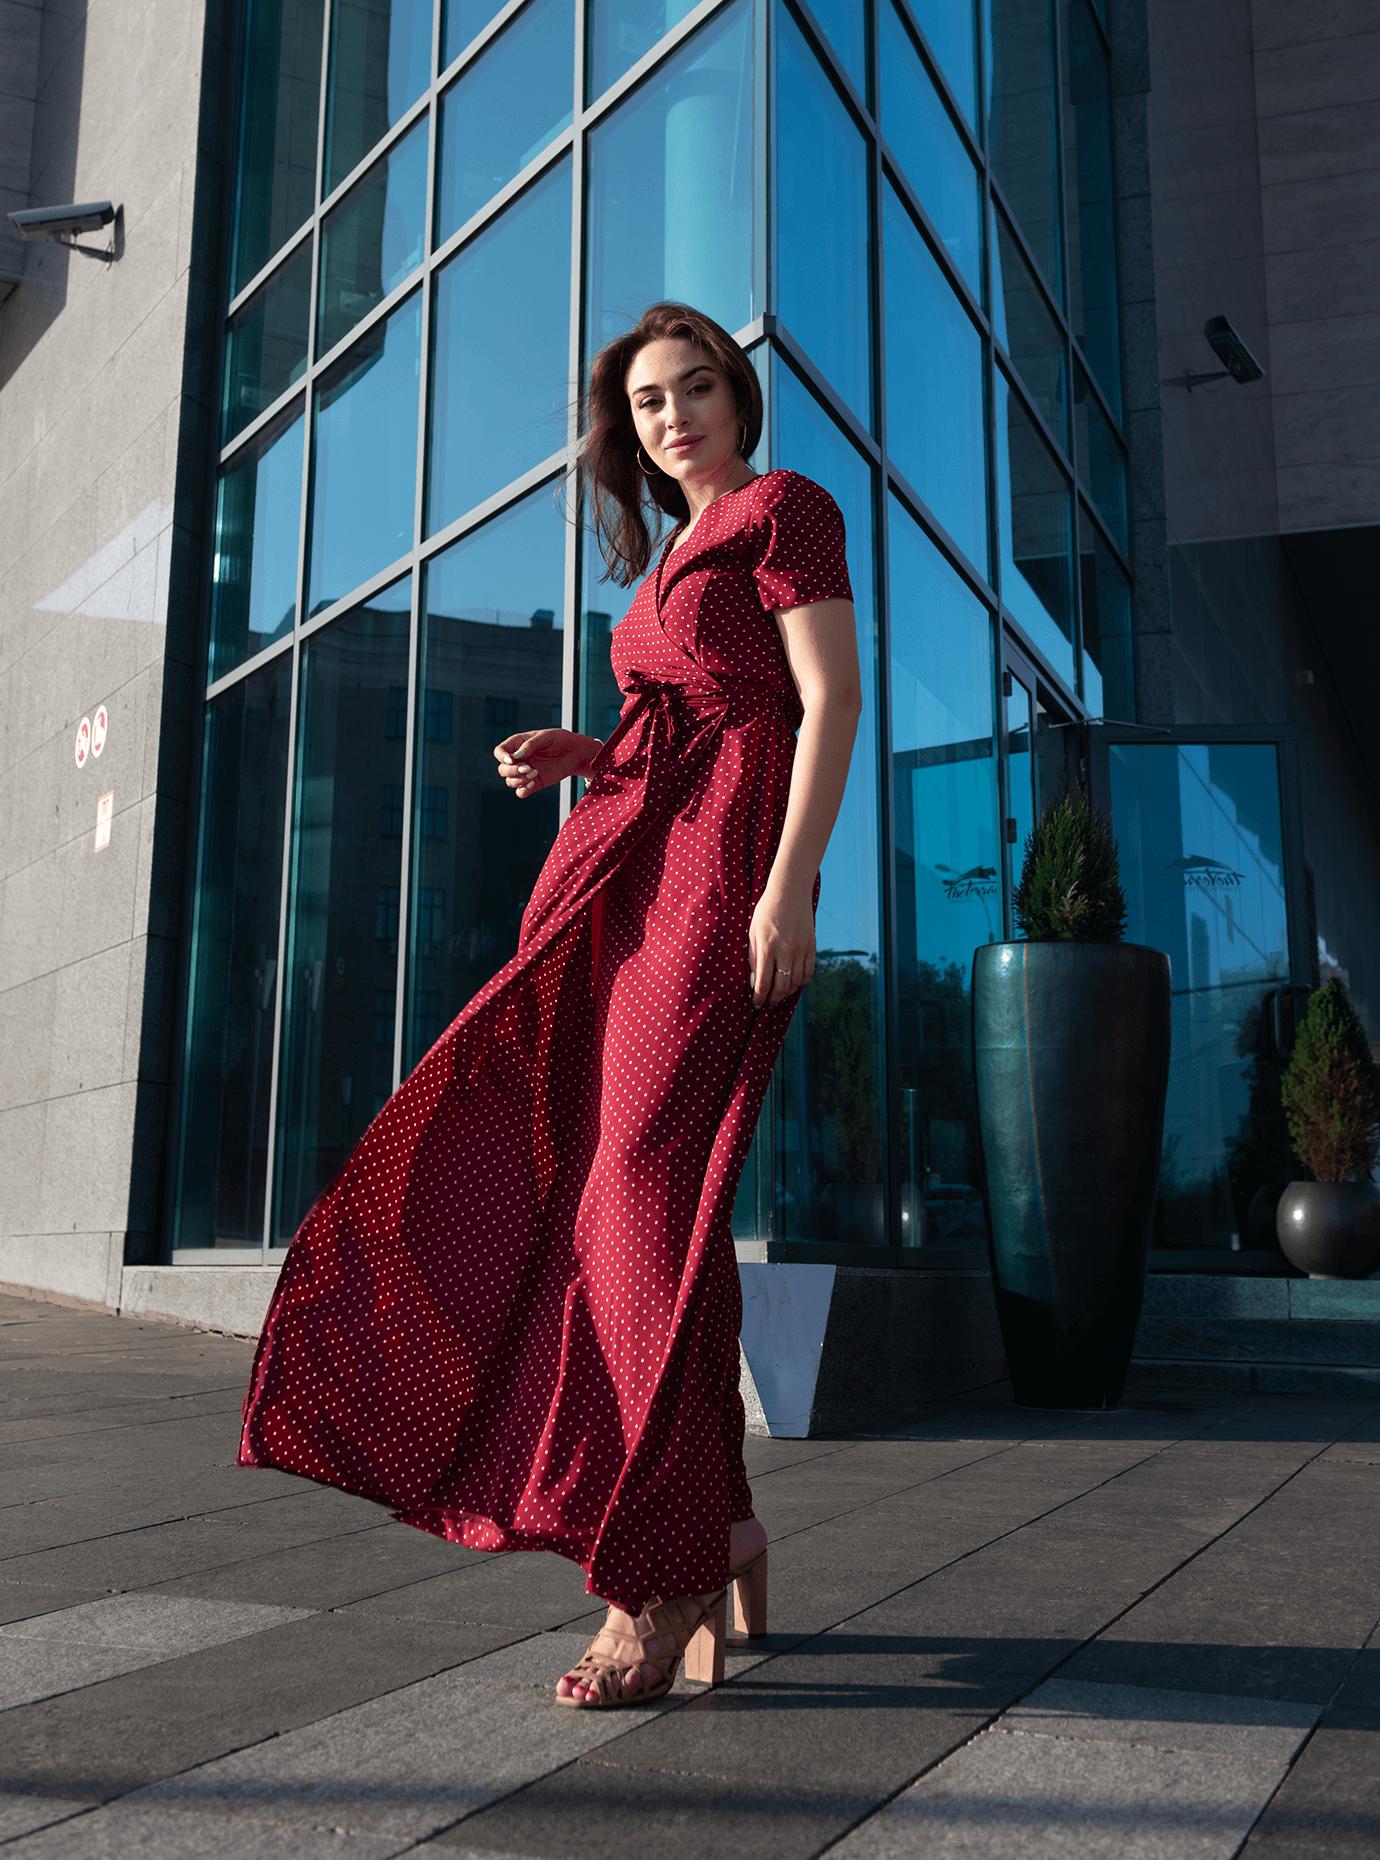 Платье Ruta Бордо S-M (04-8987898): фото - Alster.ua